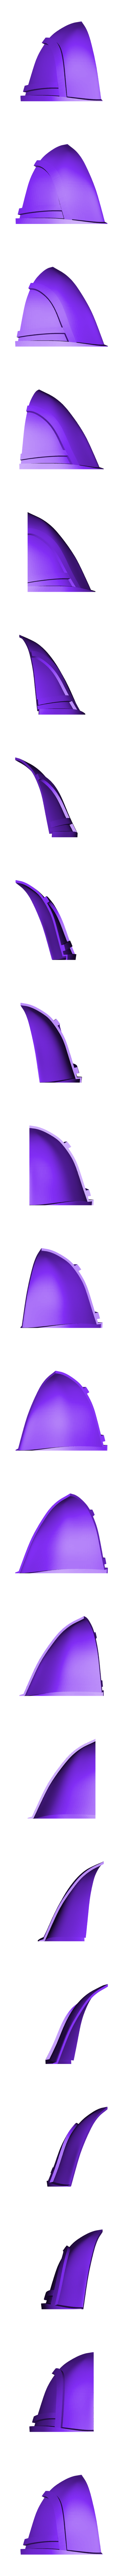 Part_1_v2_5.stl Download free STL file  Iron Musketeer's Helmet (Final Fantasy XI) • 3D printable design, VillainousPropShop